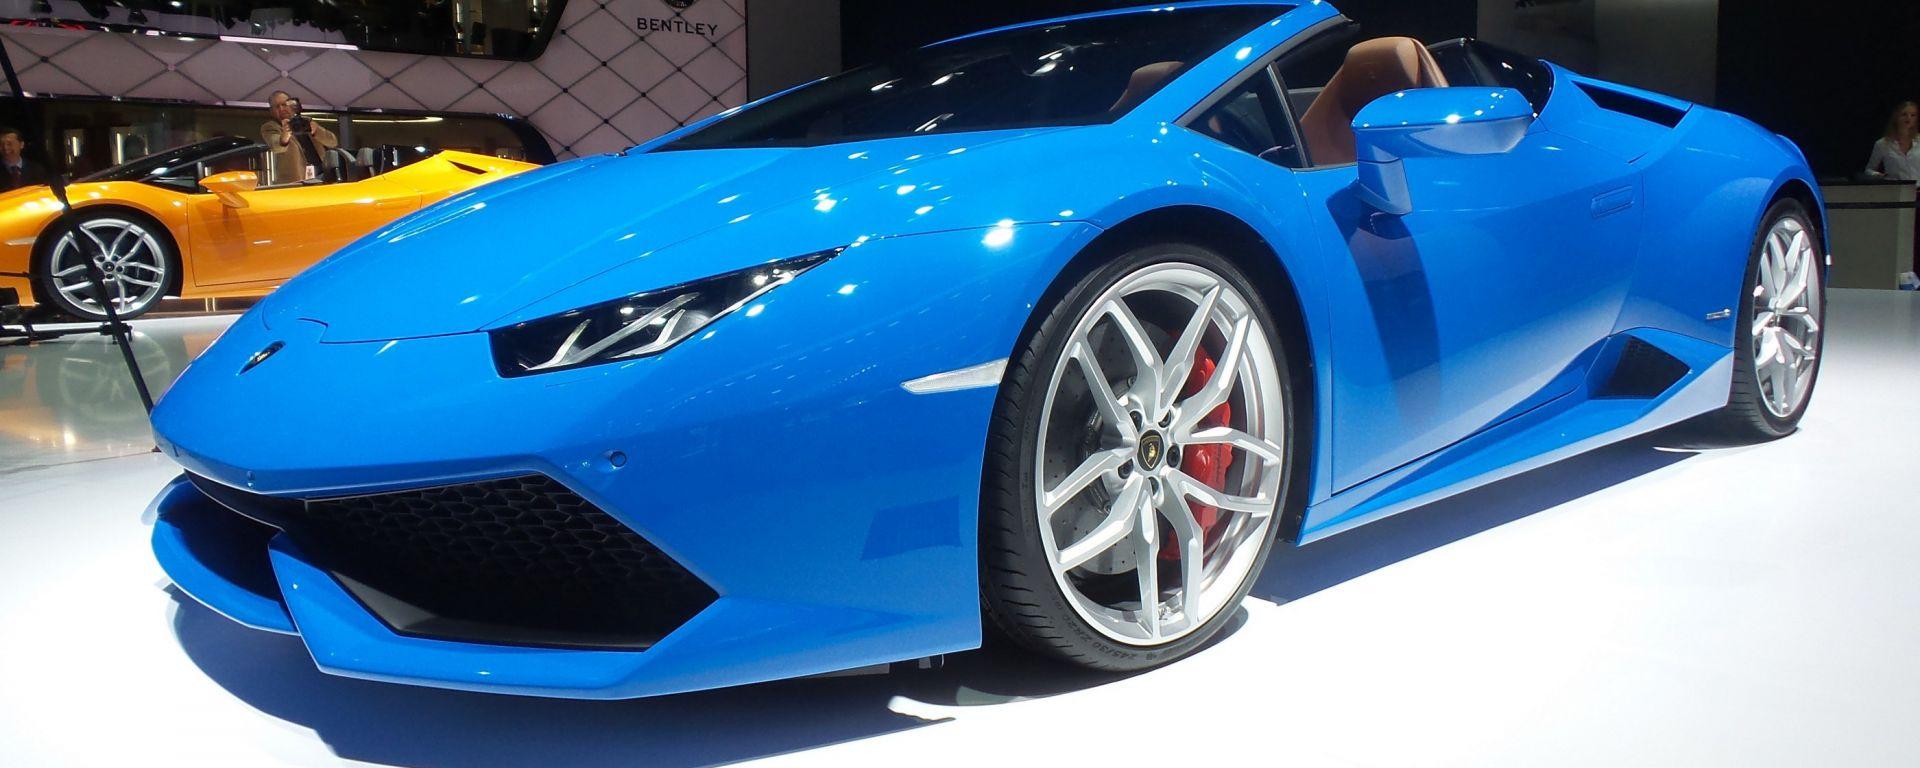 Lamborghini Huracan LP 610-4 Spyder: foto LIVE e info